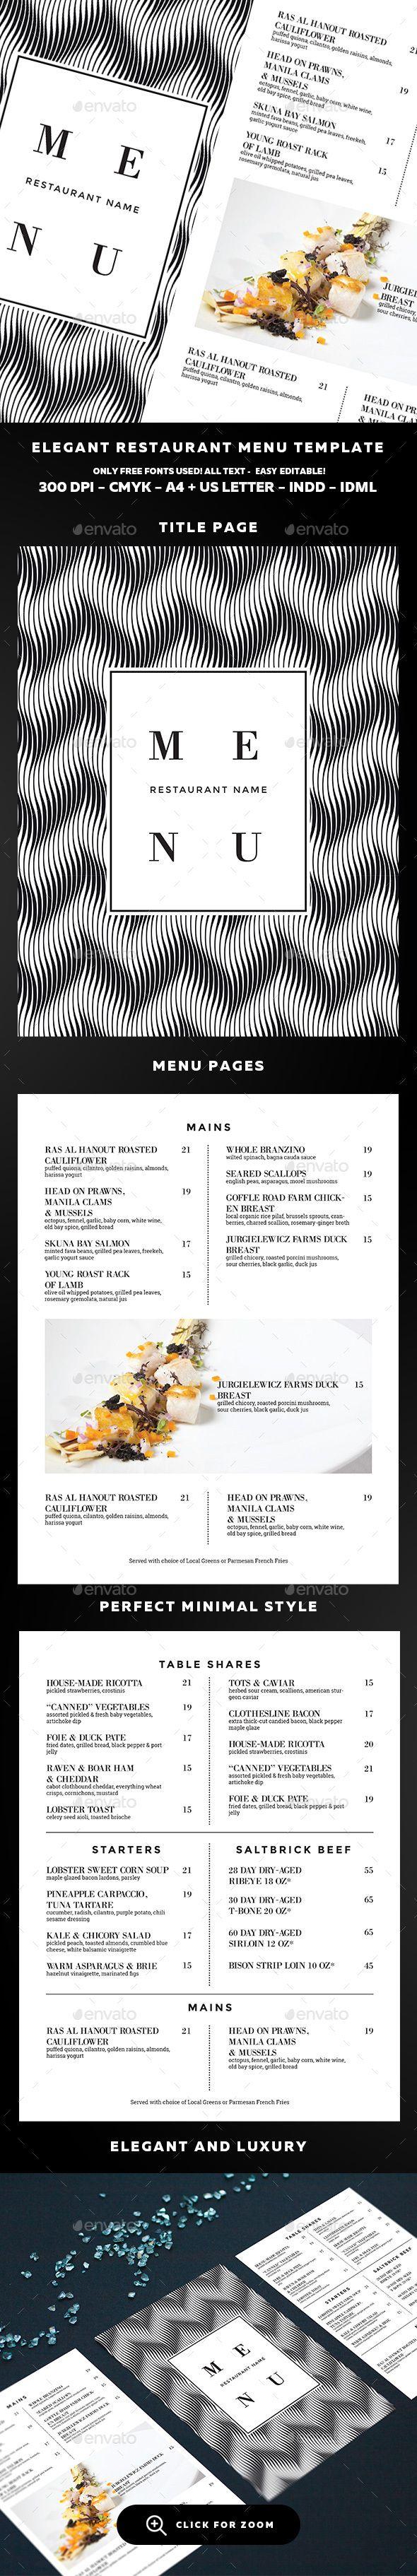 25 best ideas about restaurant menu template on pinterest menu templates menu design. Black Bedroom Furniture Sets. Home Design Ideas